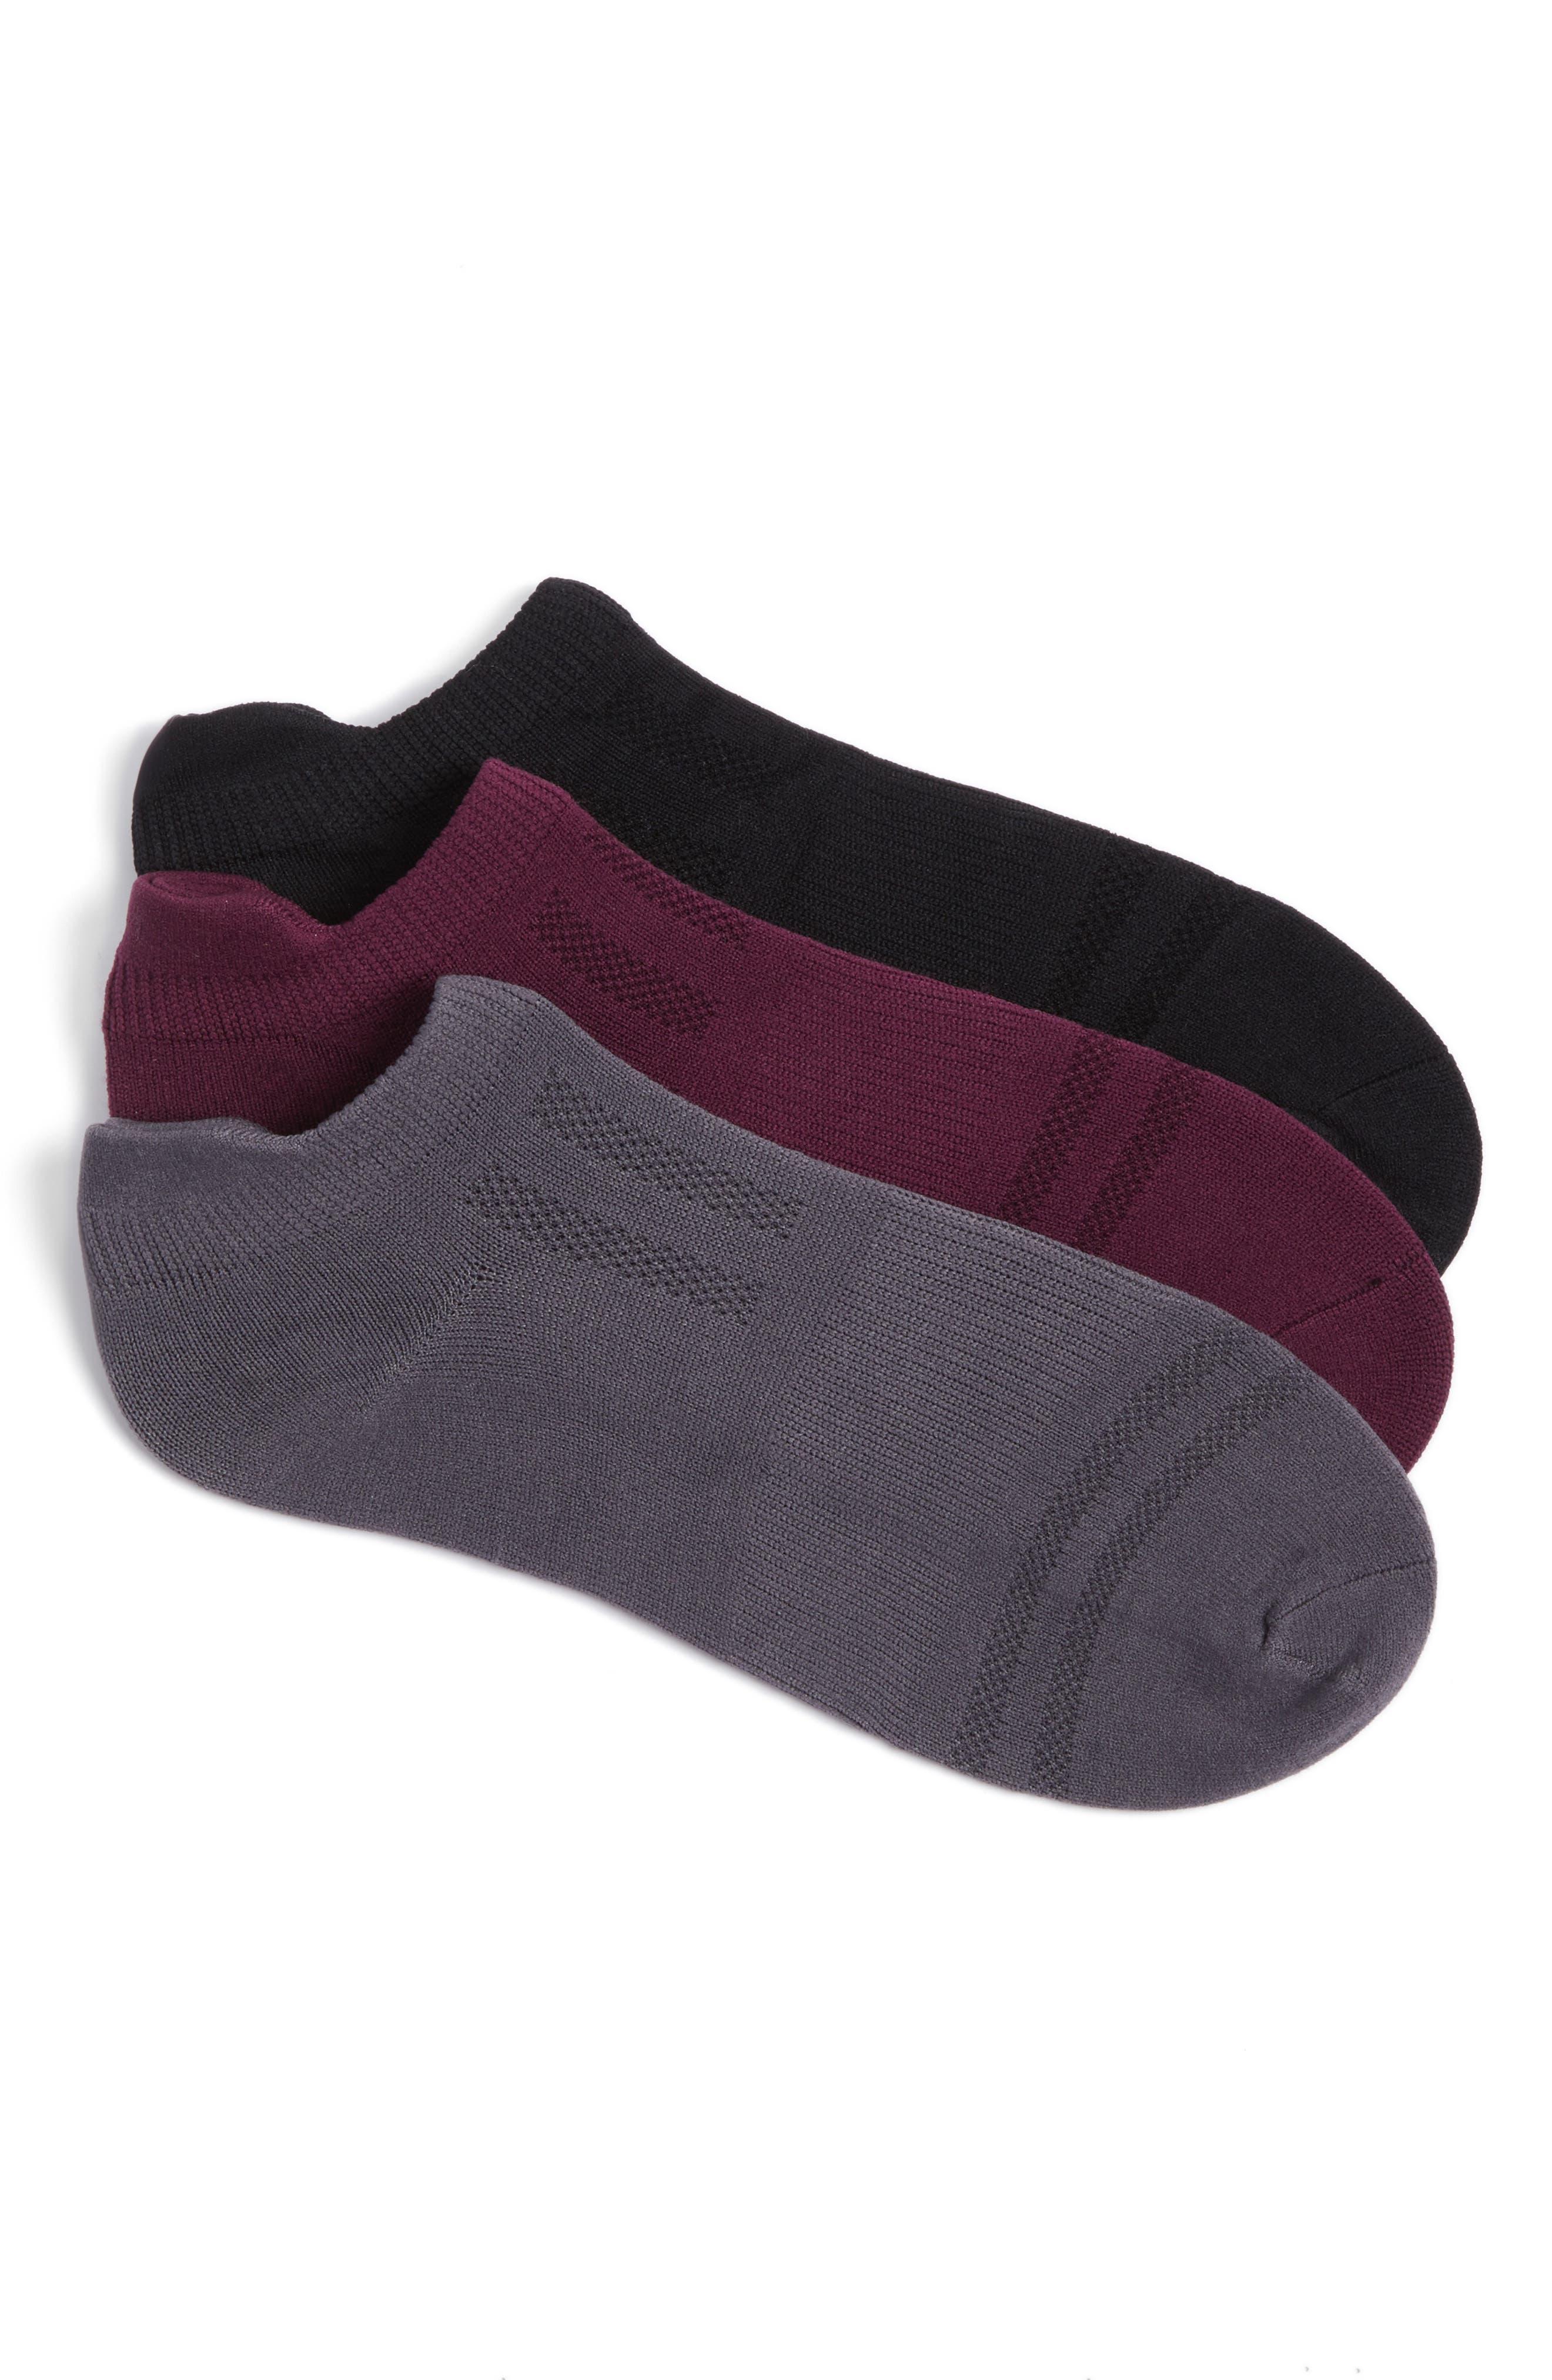 Main Image - Sof Sole 3-Pack Low Cut Socks